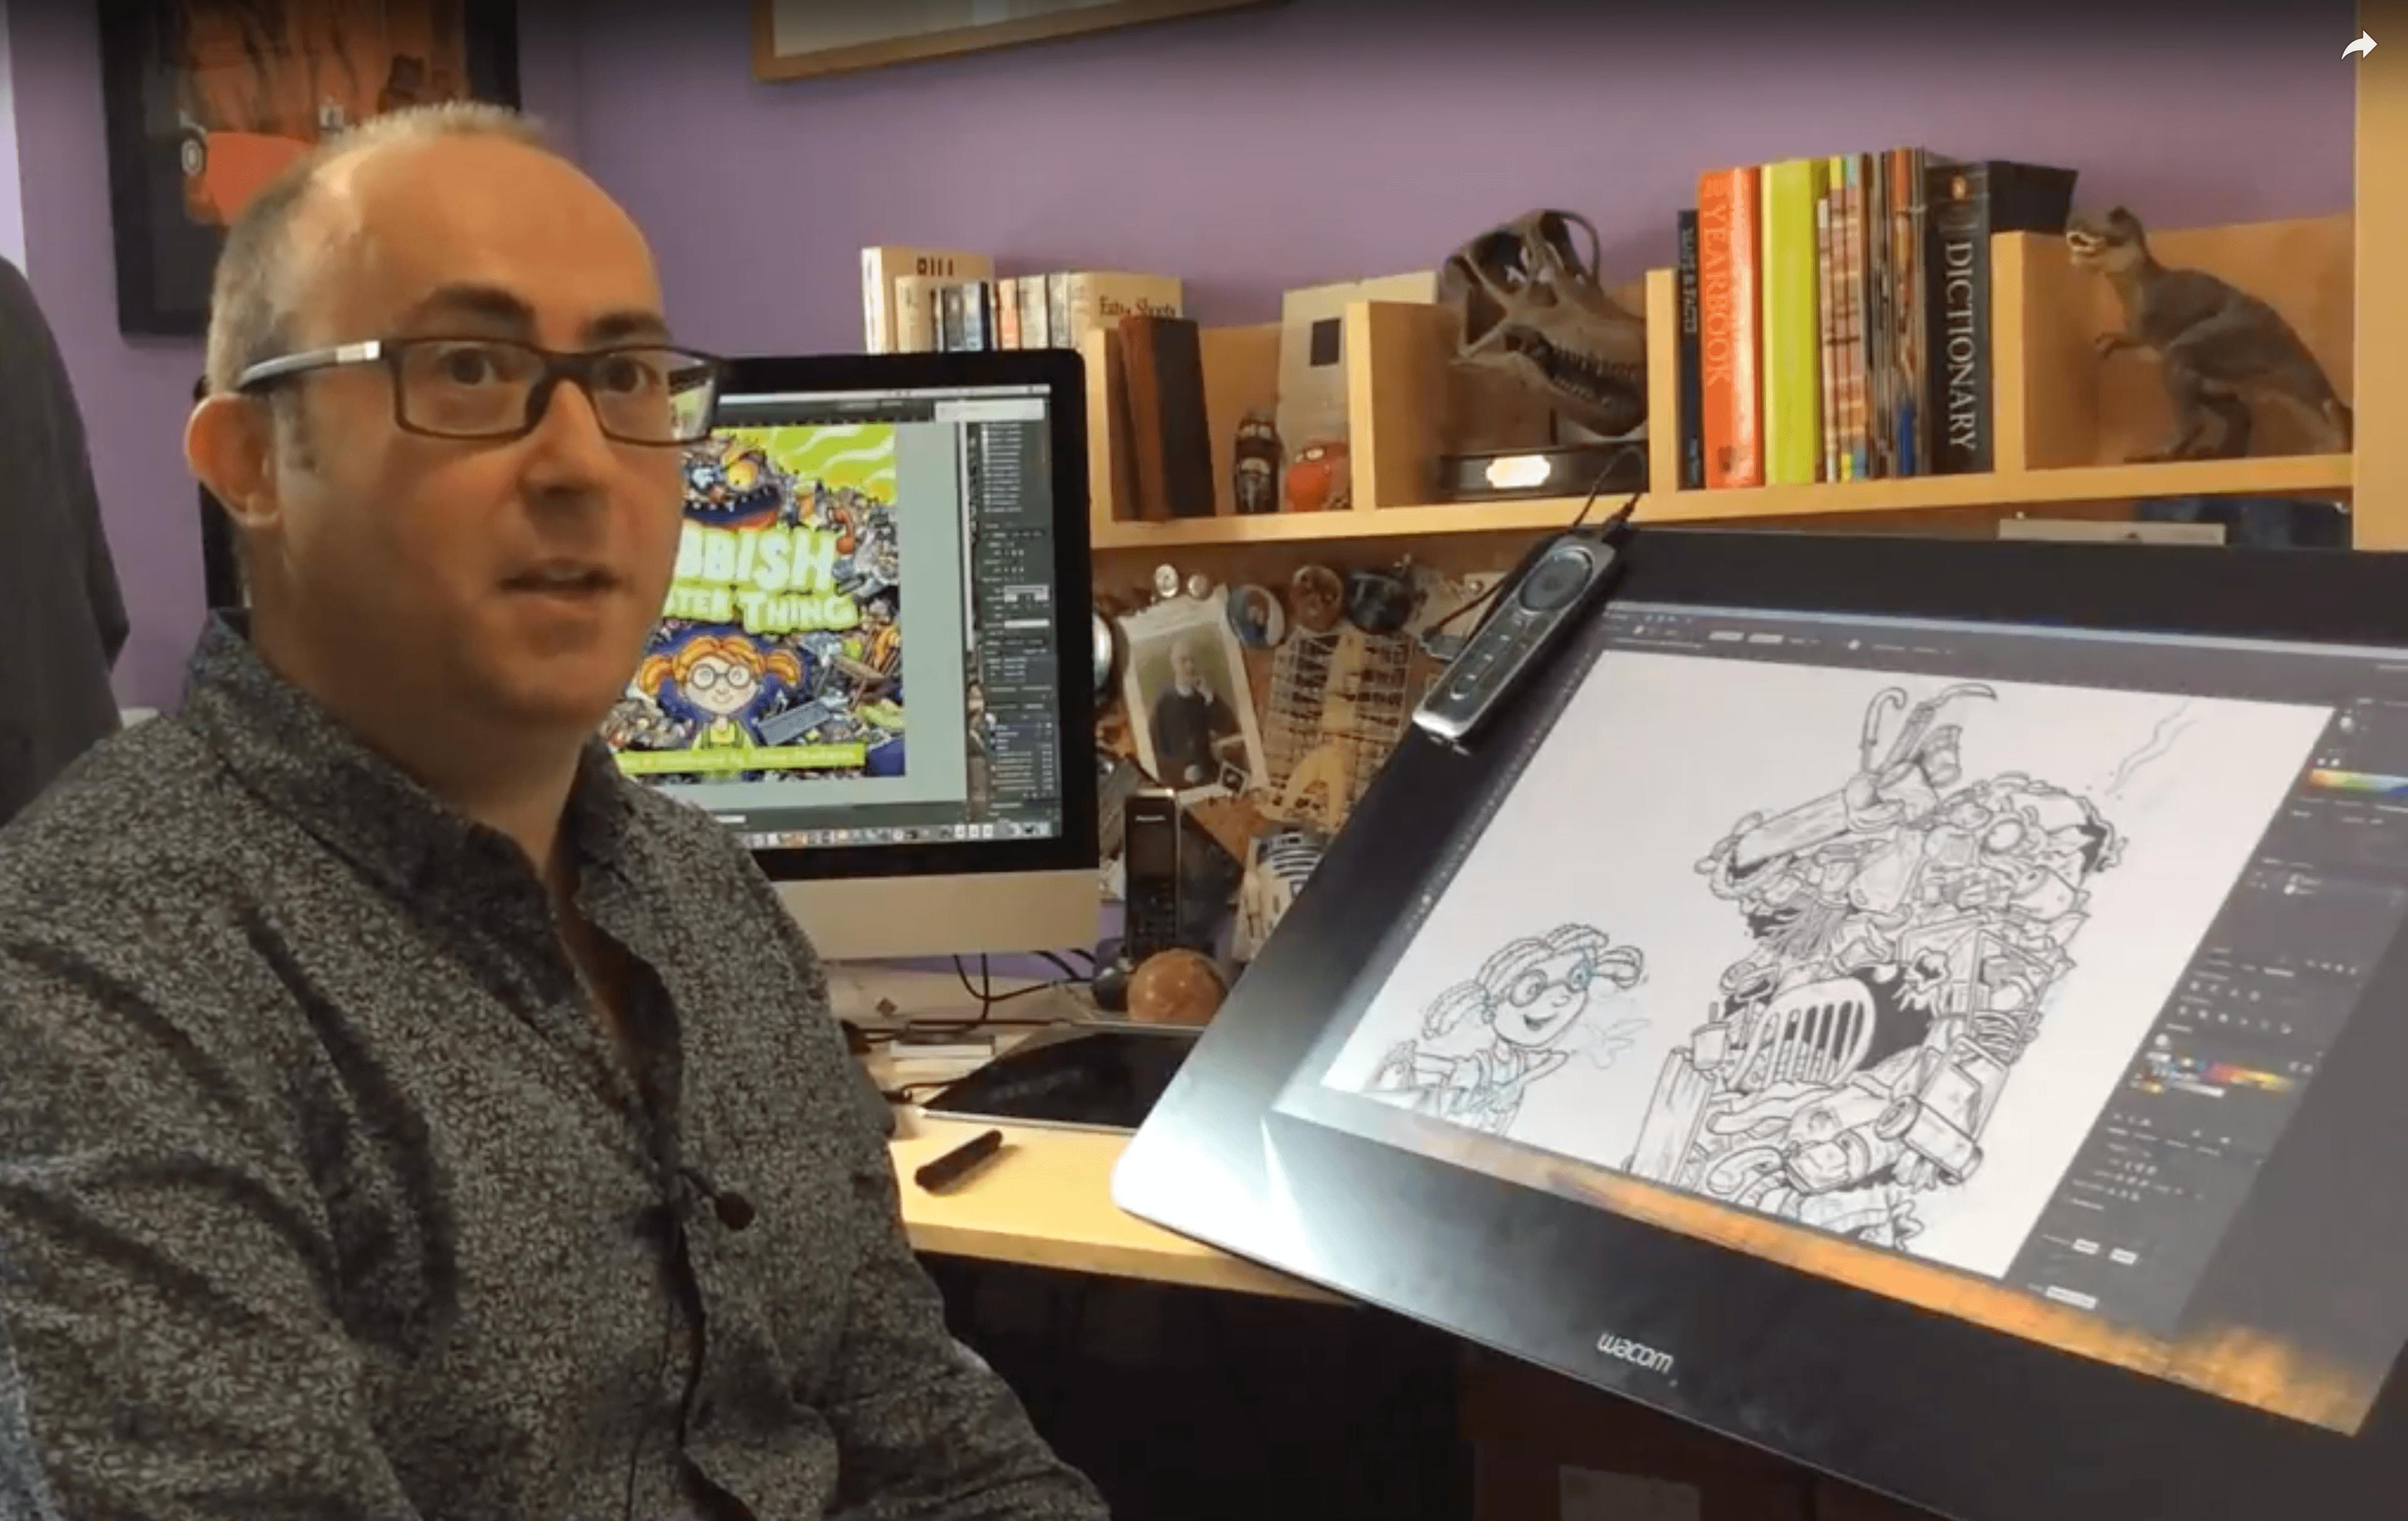 Simon Chadwick in his studio